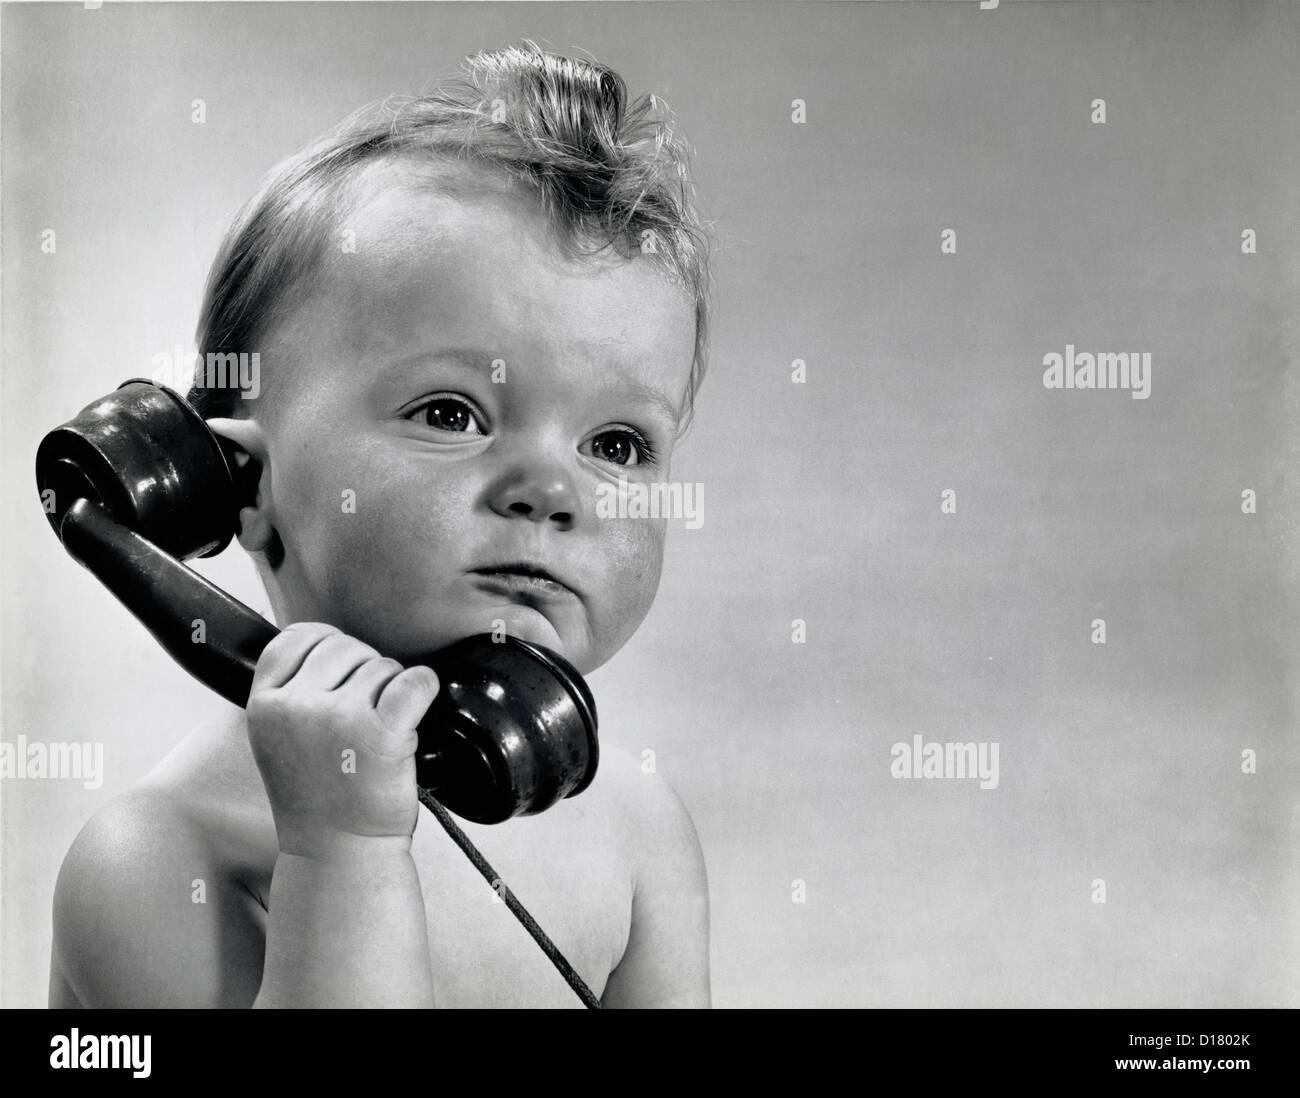 Vintage photo de baby boy talking on phone Photo Stock